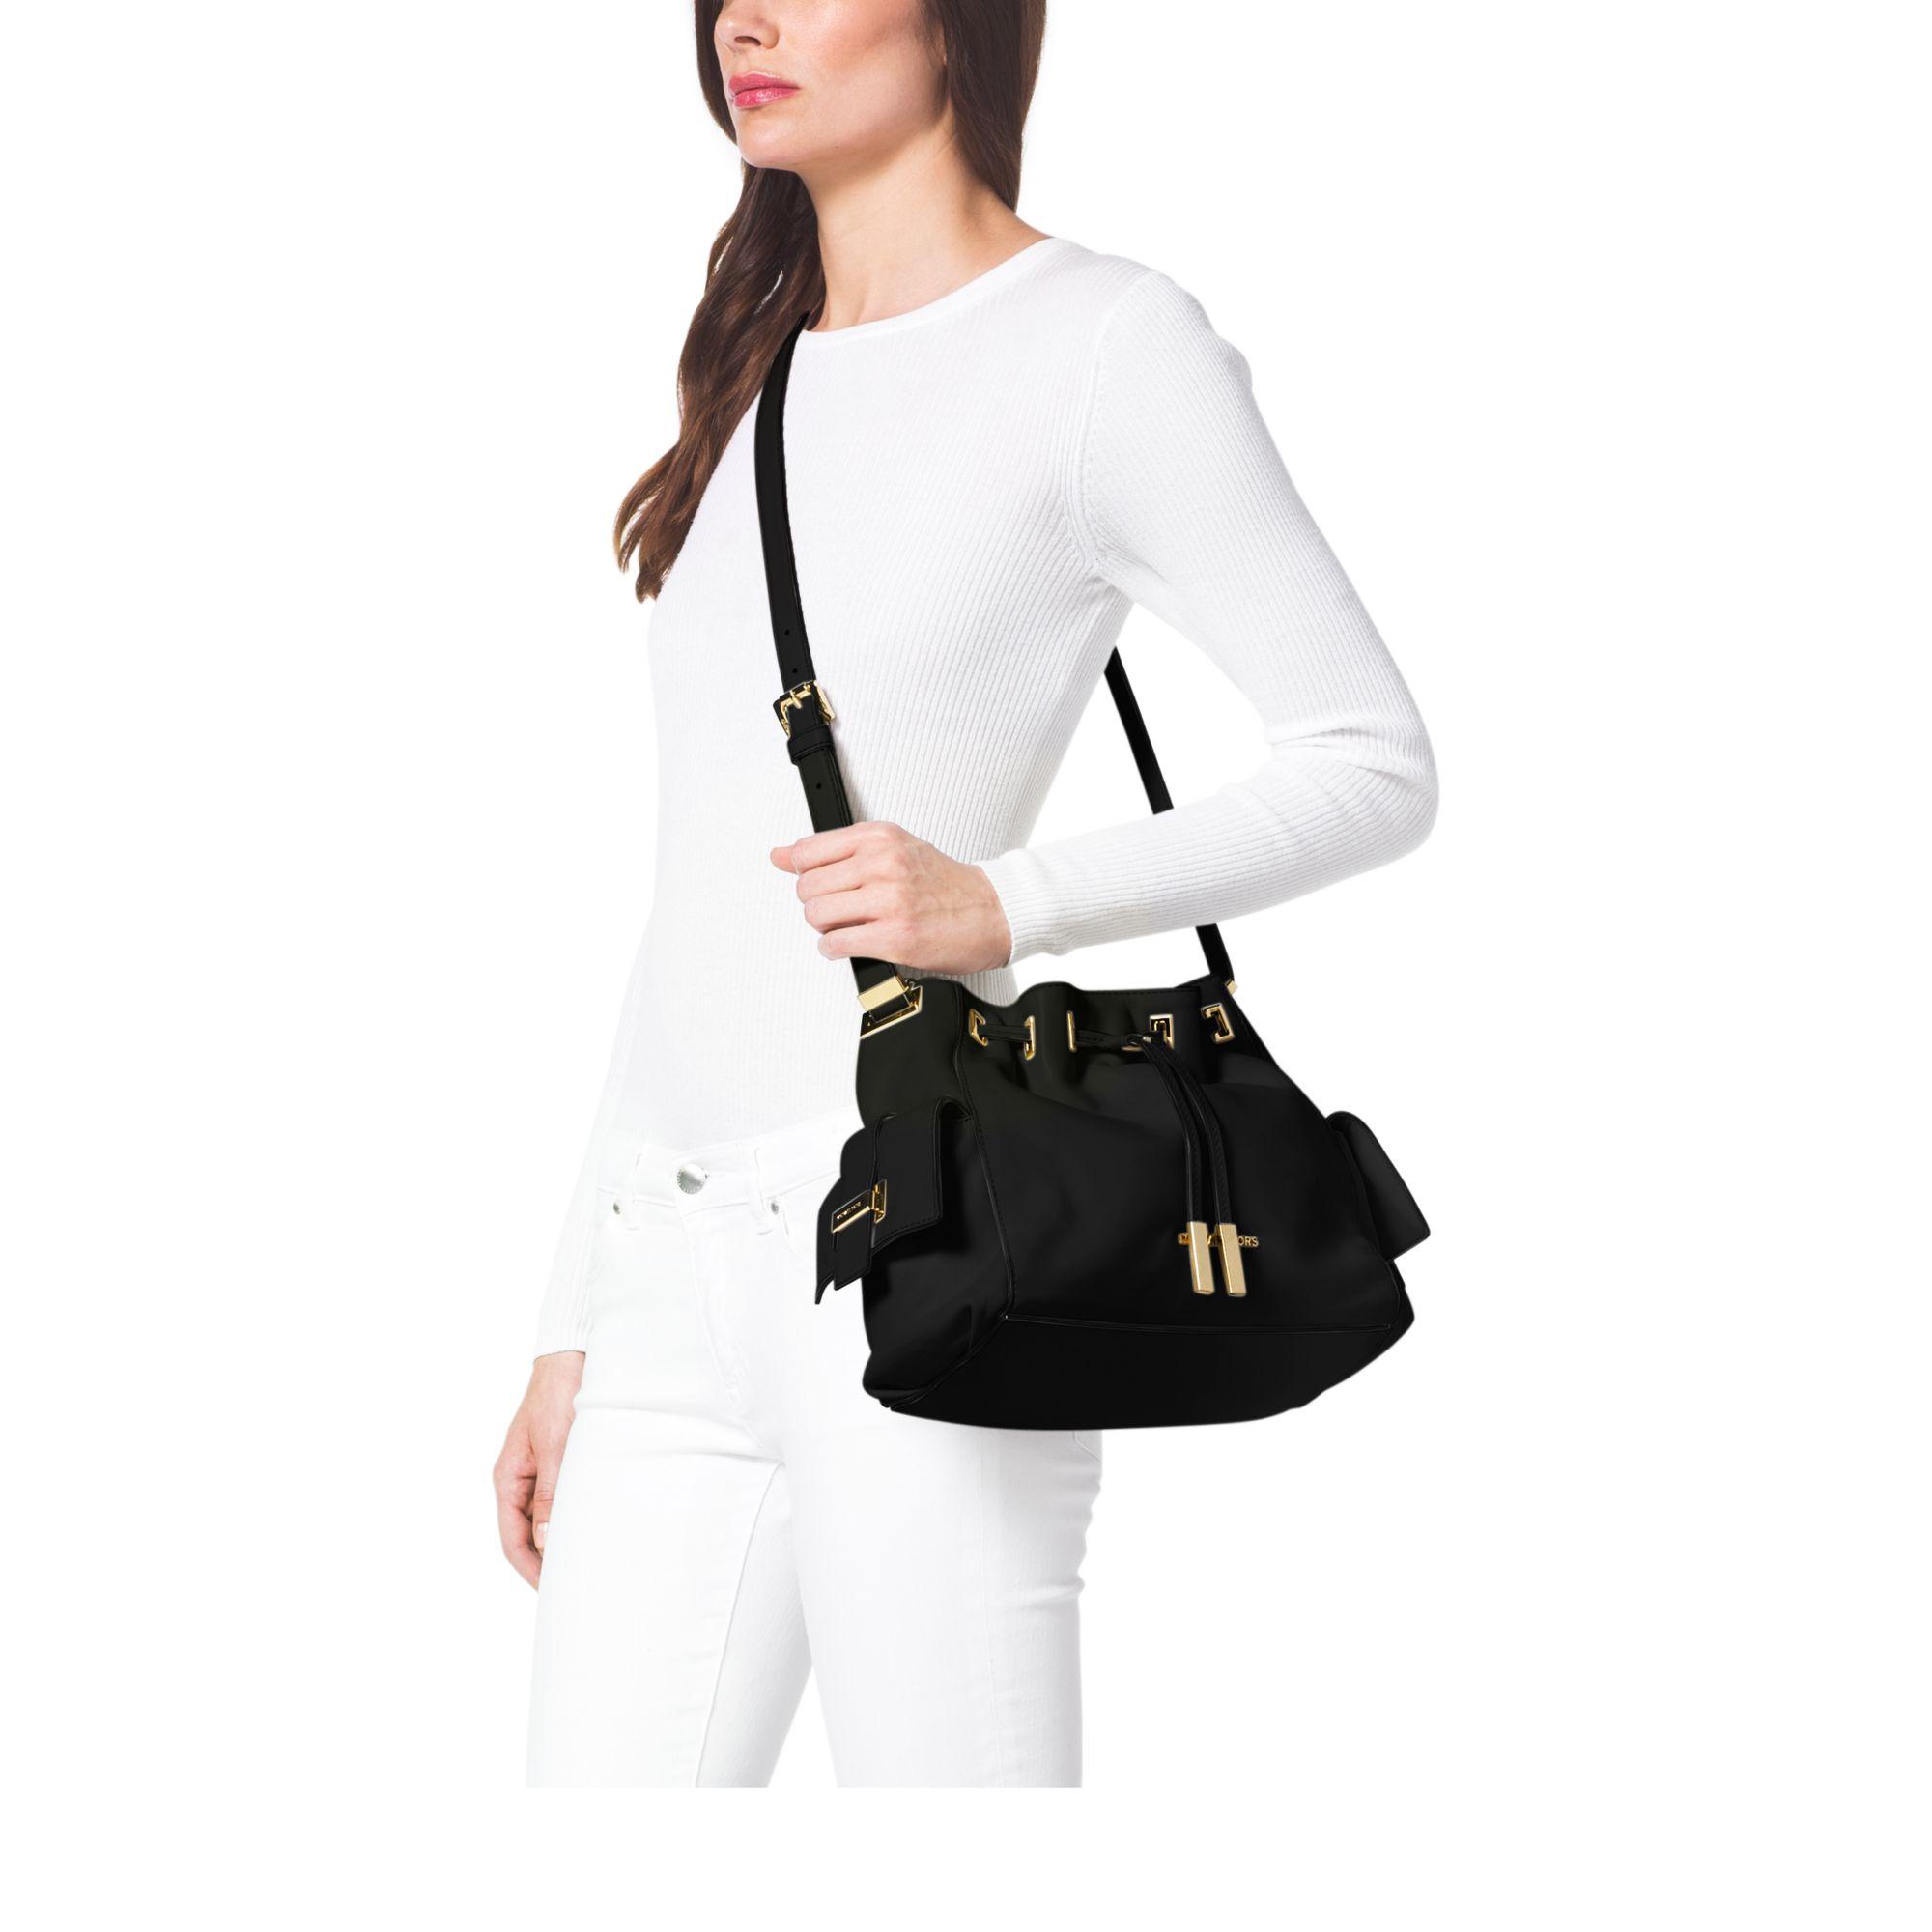 8e00e151ab9c ... Bag €150.00 Michael kors Marly Medium Drawstring Leather Messenger in  Bl ...